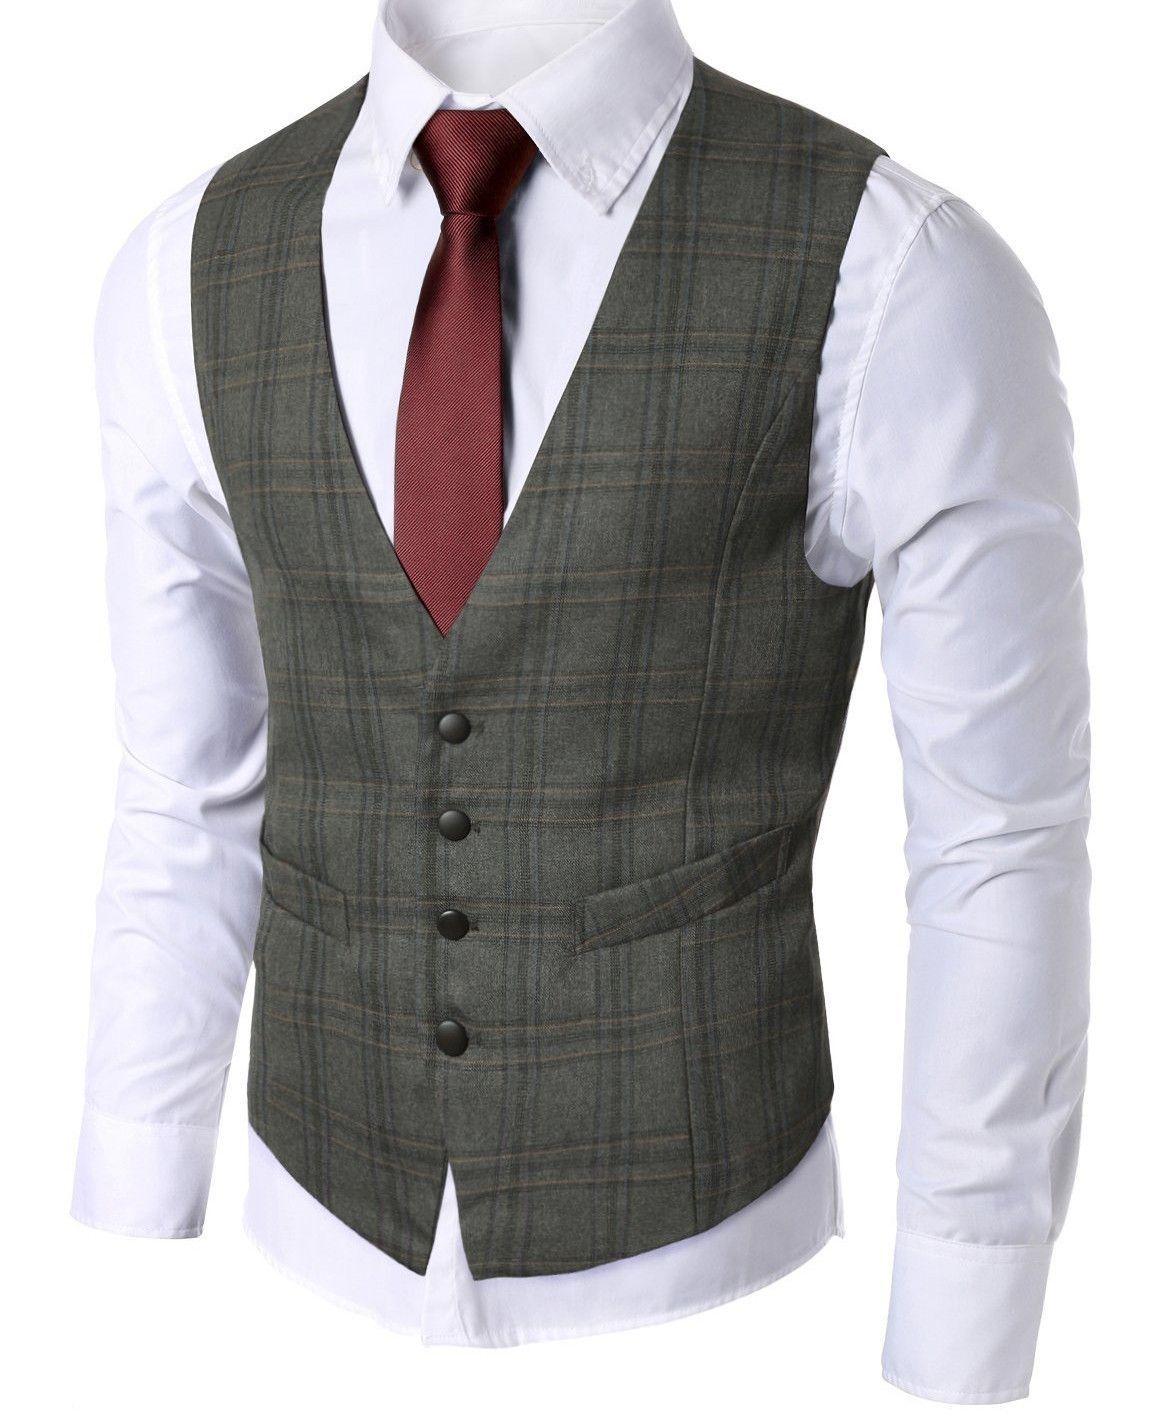 Classic Mens Check Waistcoat Vest | My Style | Pinterest | Grey ...